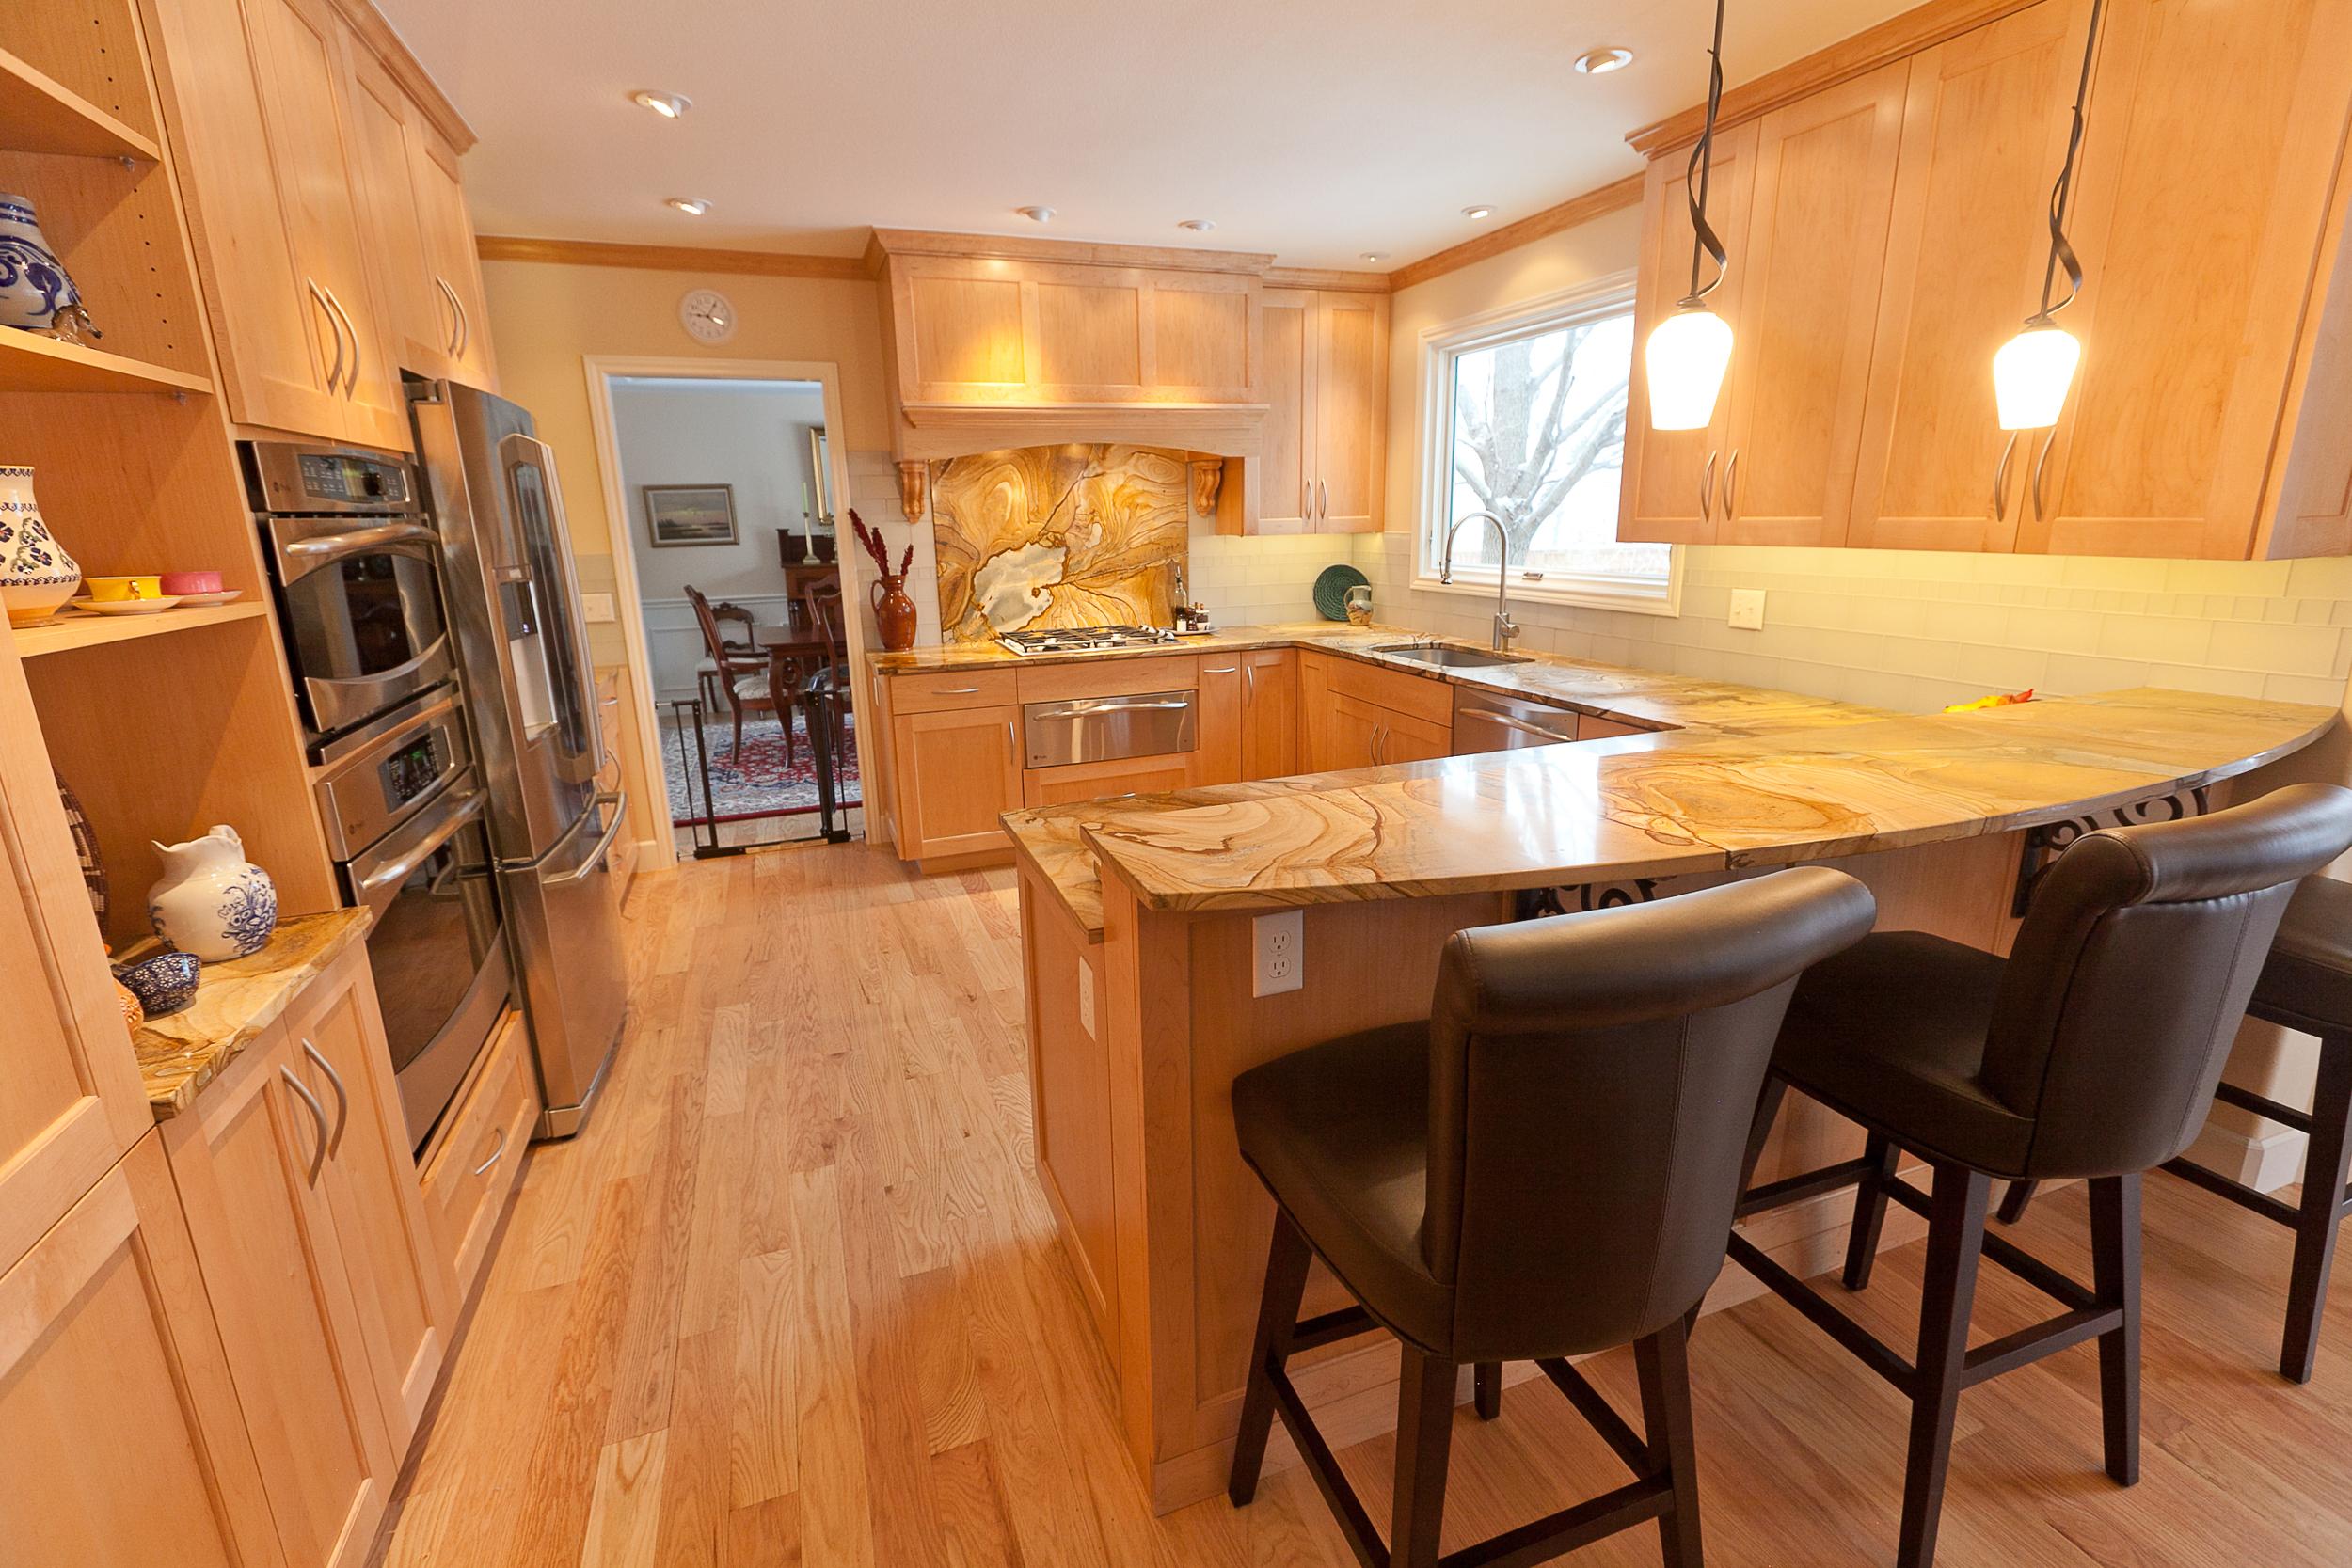 kitchens 14.jpg